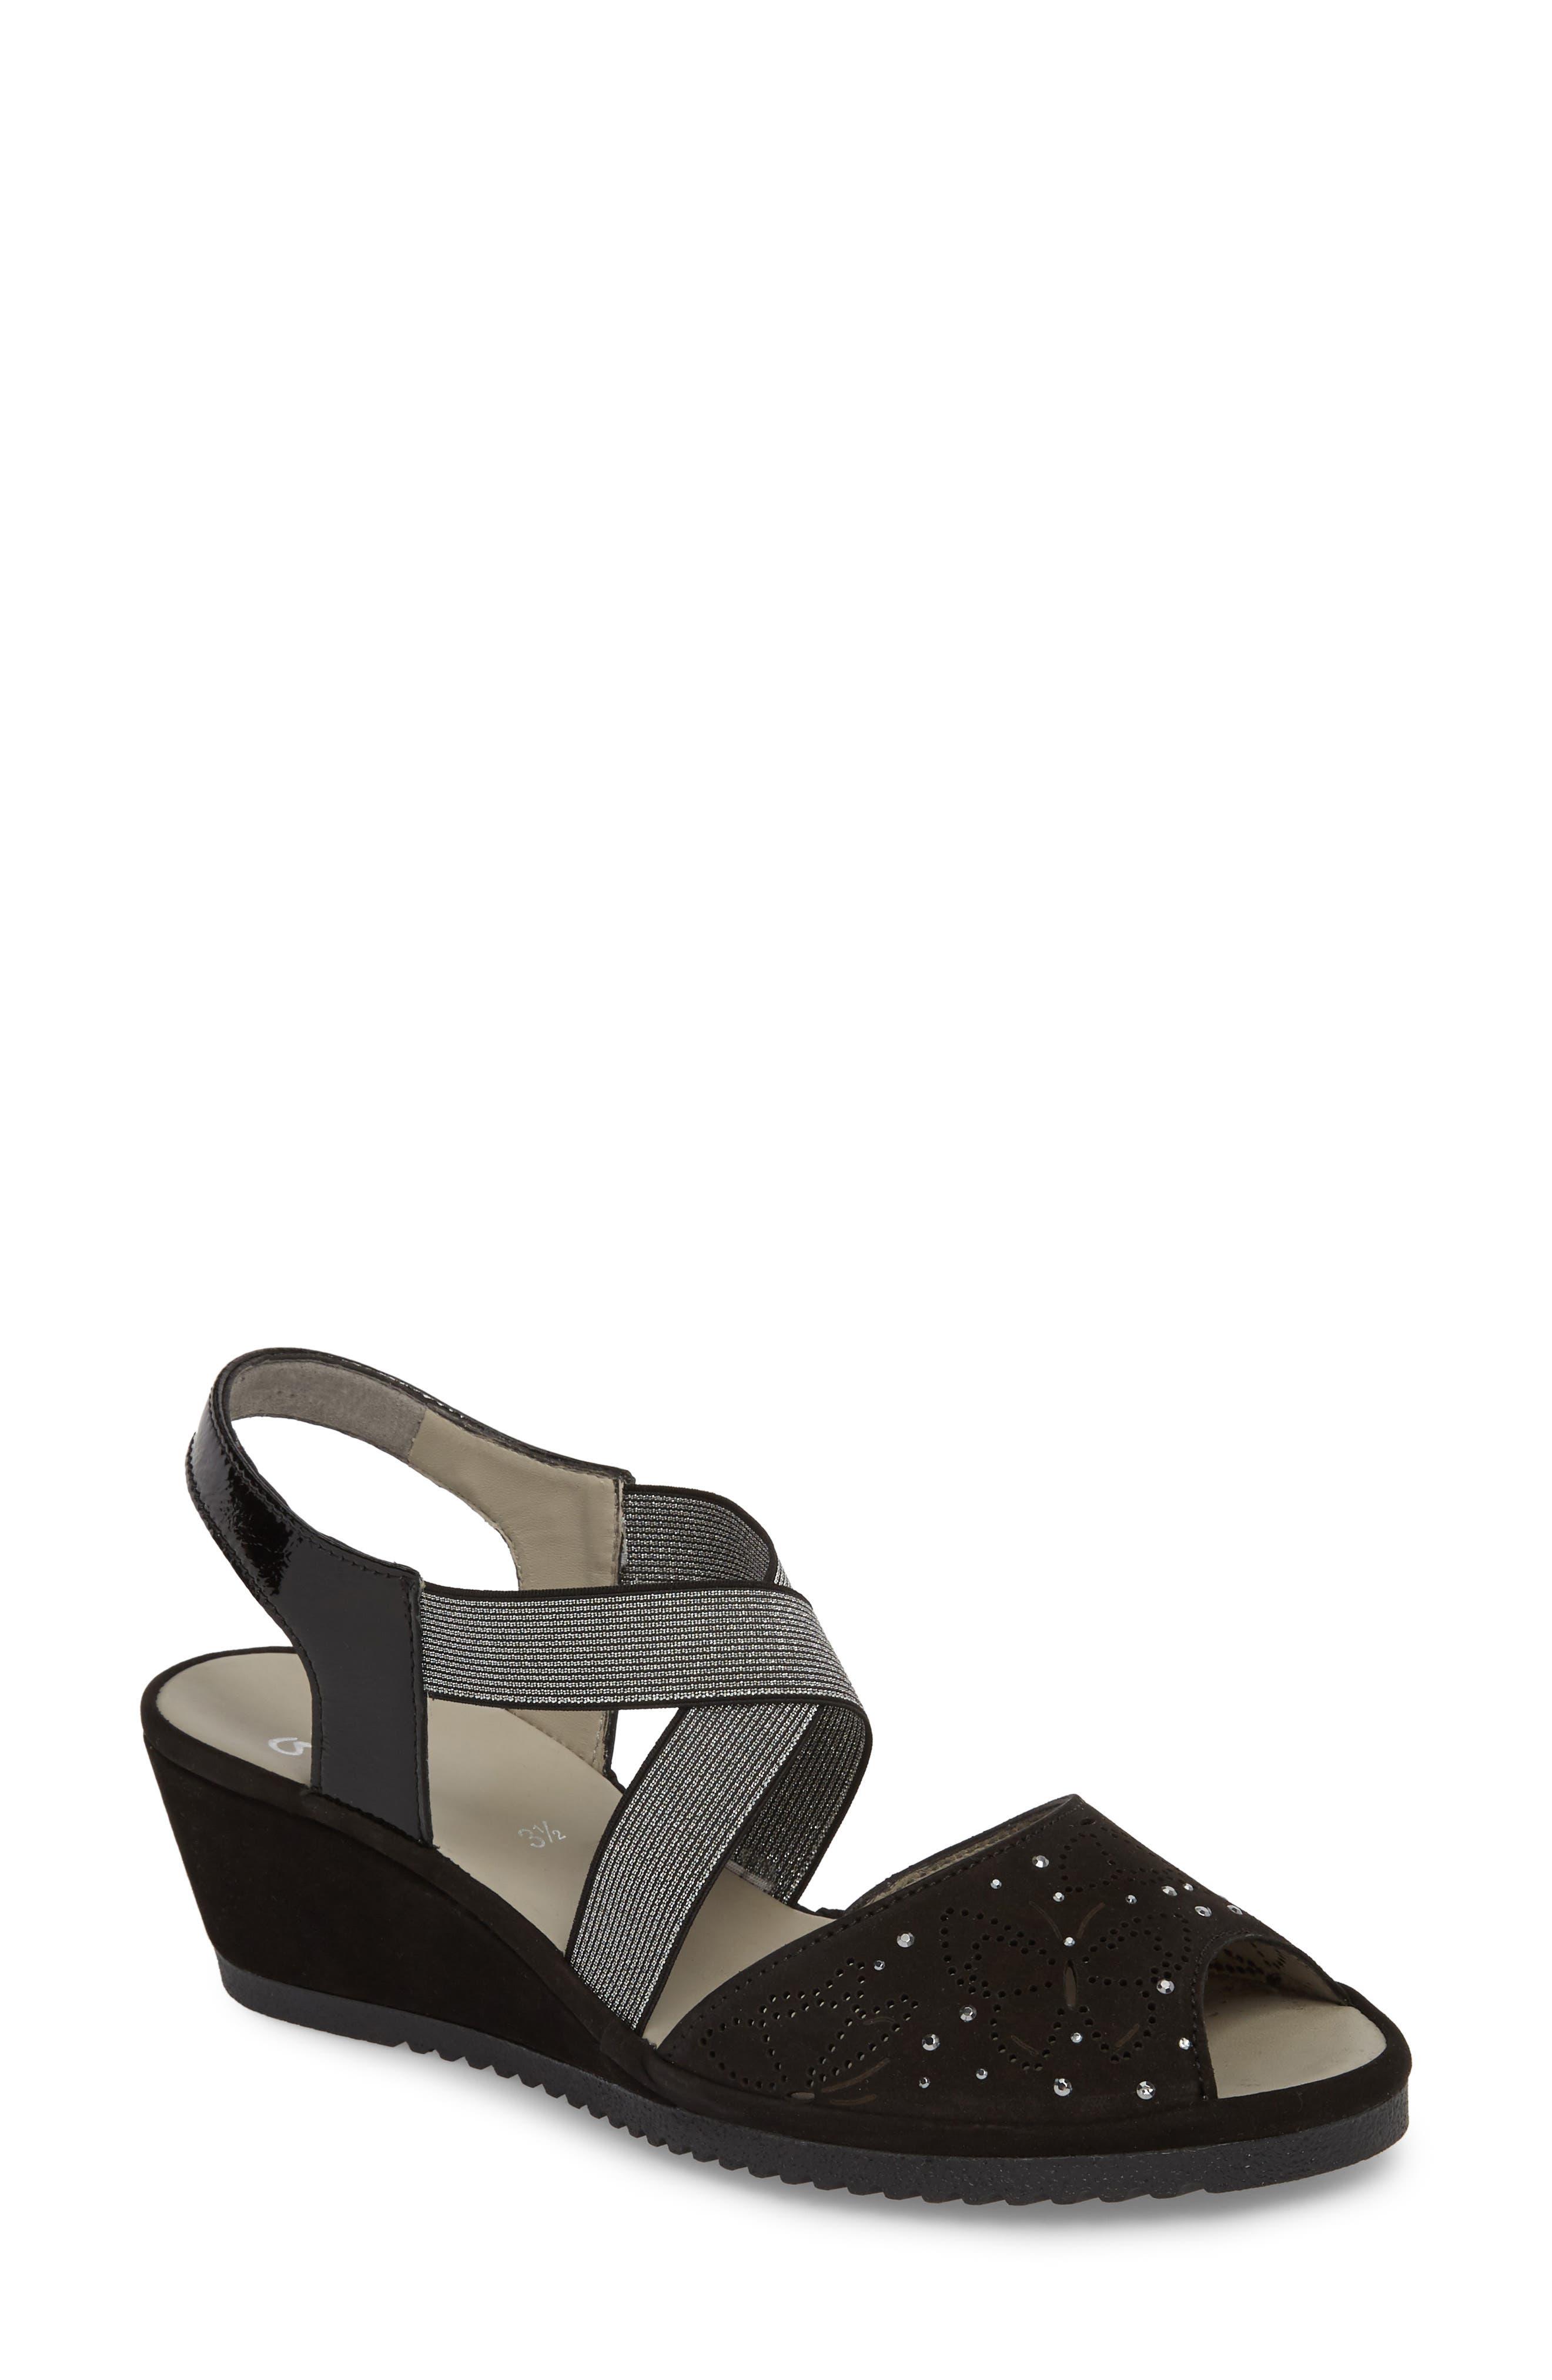 Celia Wedge Sandal,                         Main,                         color, BLACK NUBUCK